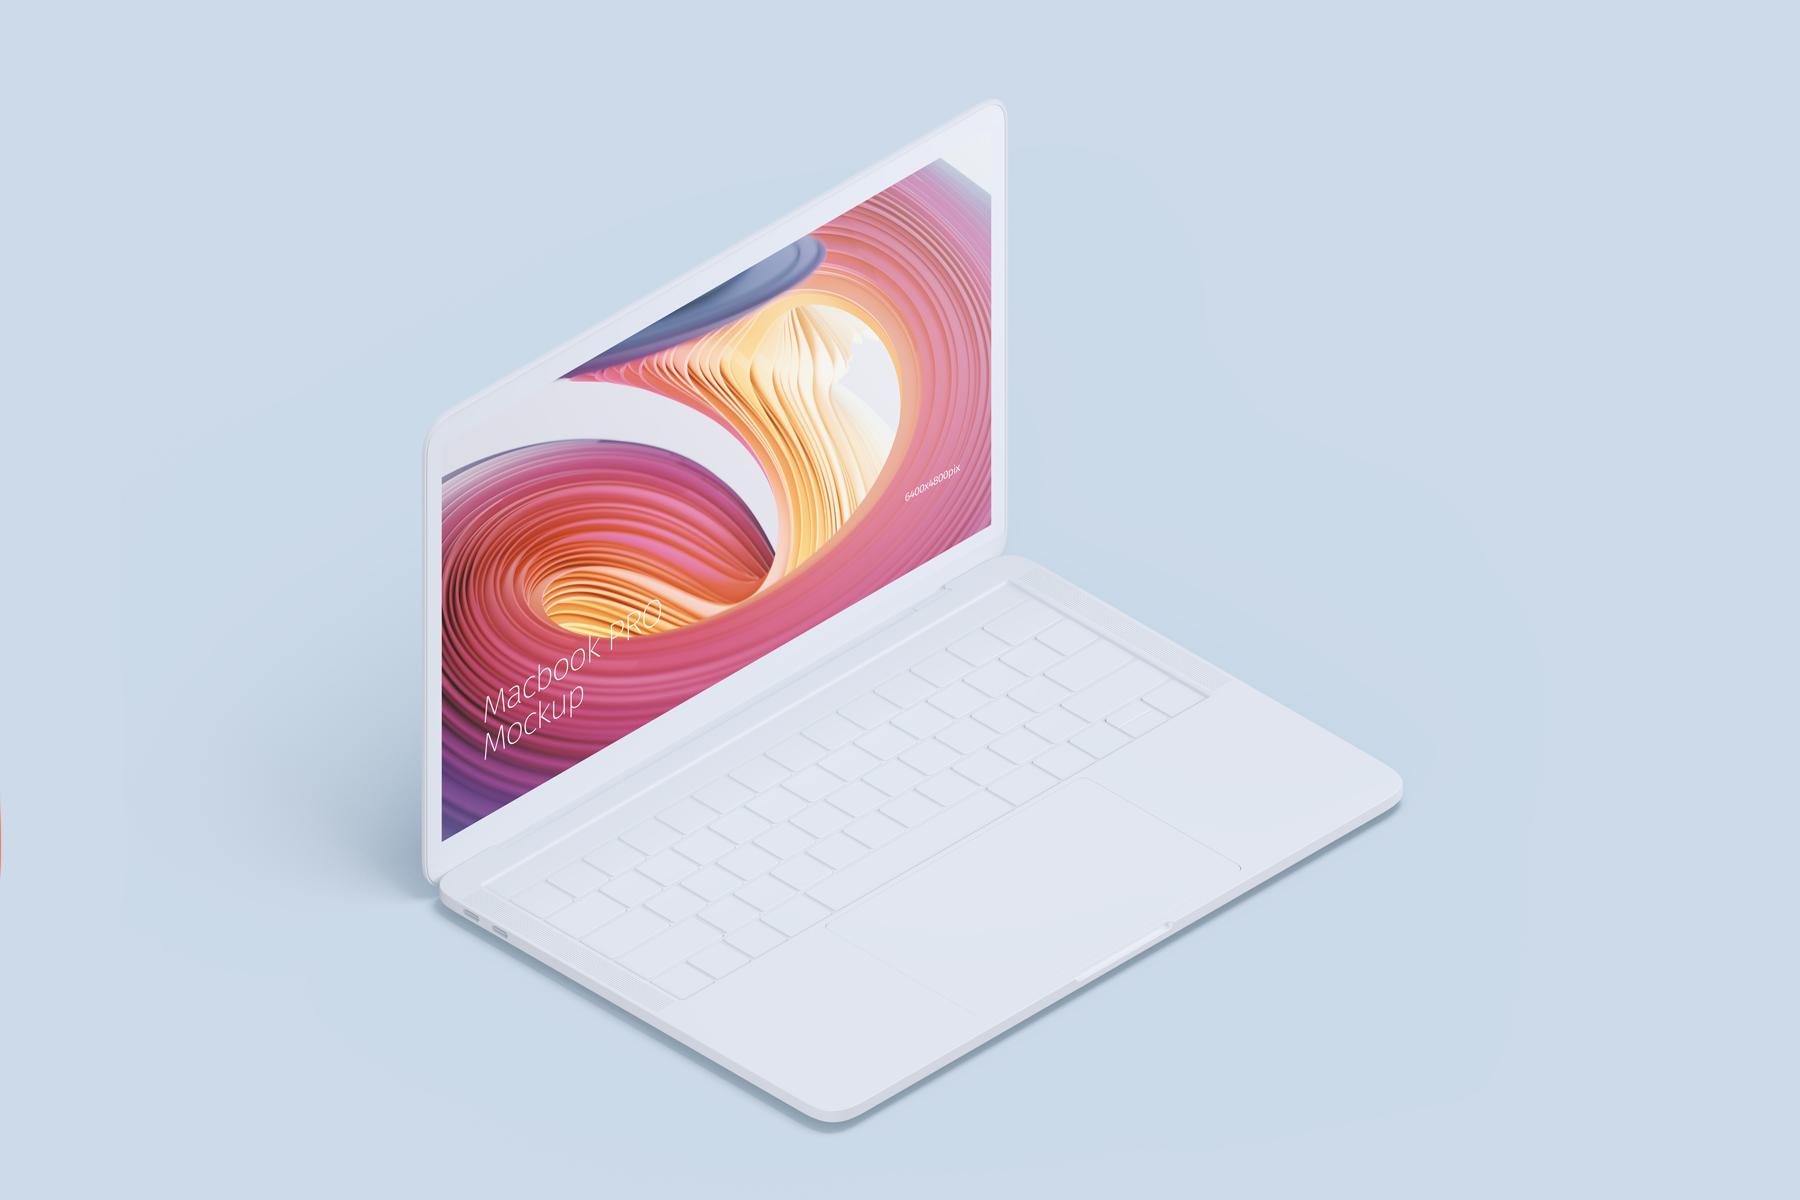 Macbook PRO Creative Mockup example image 7